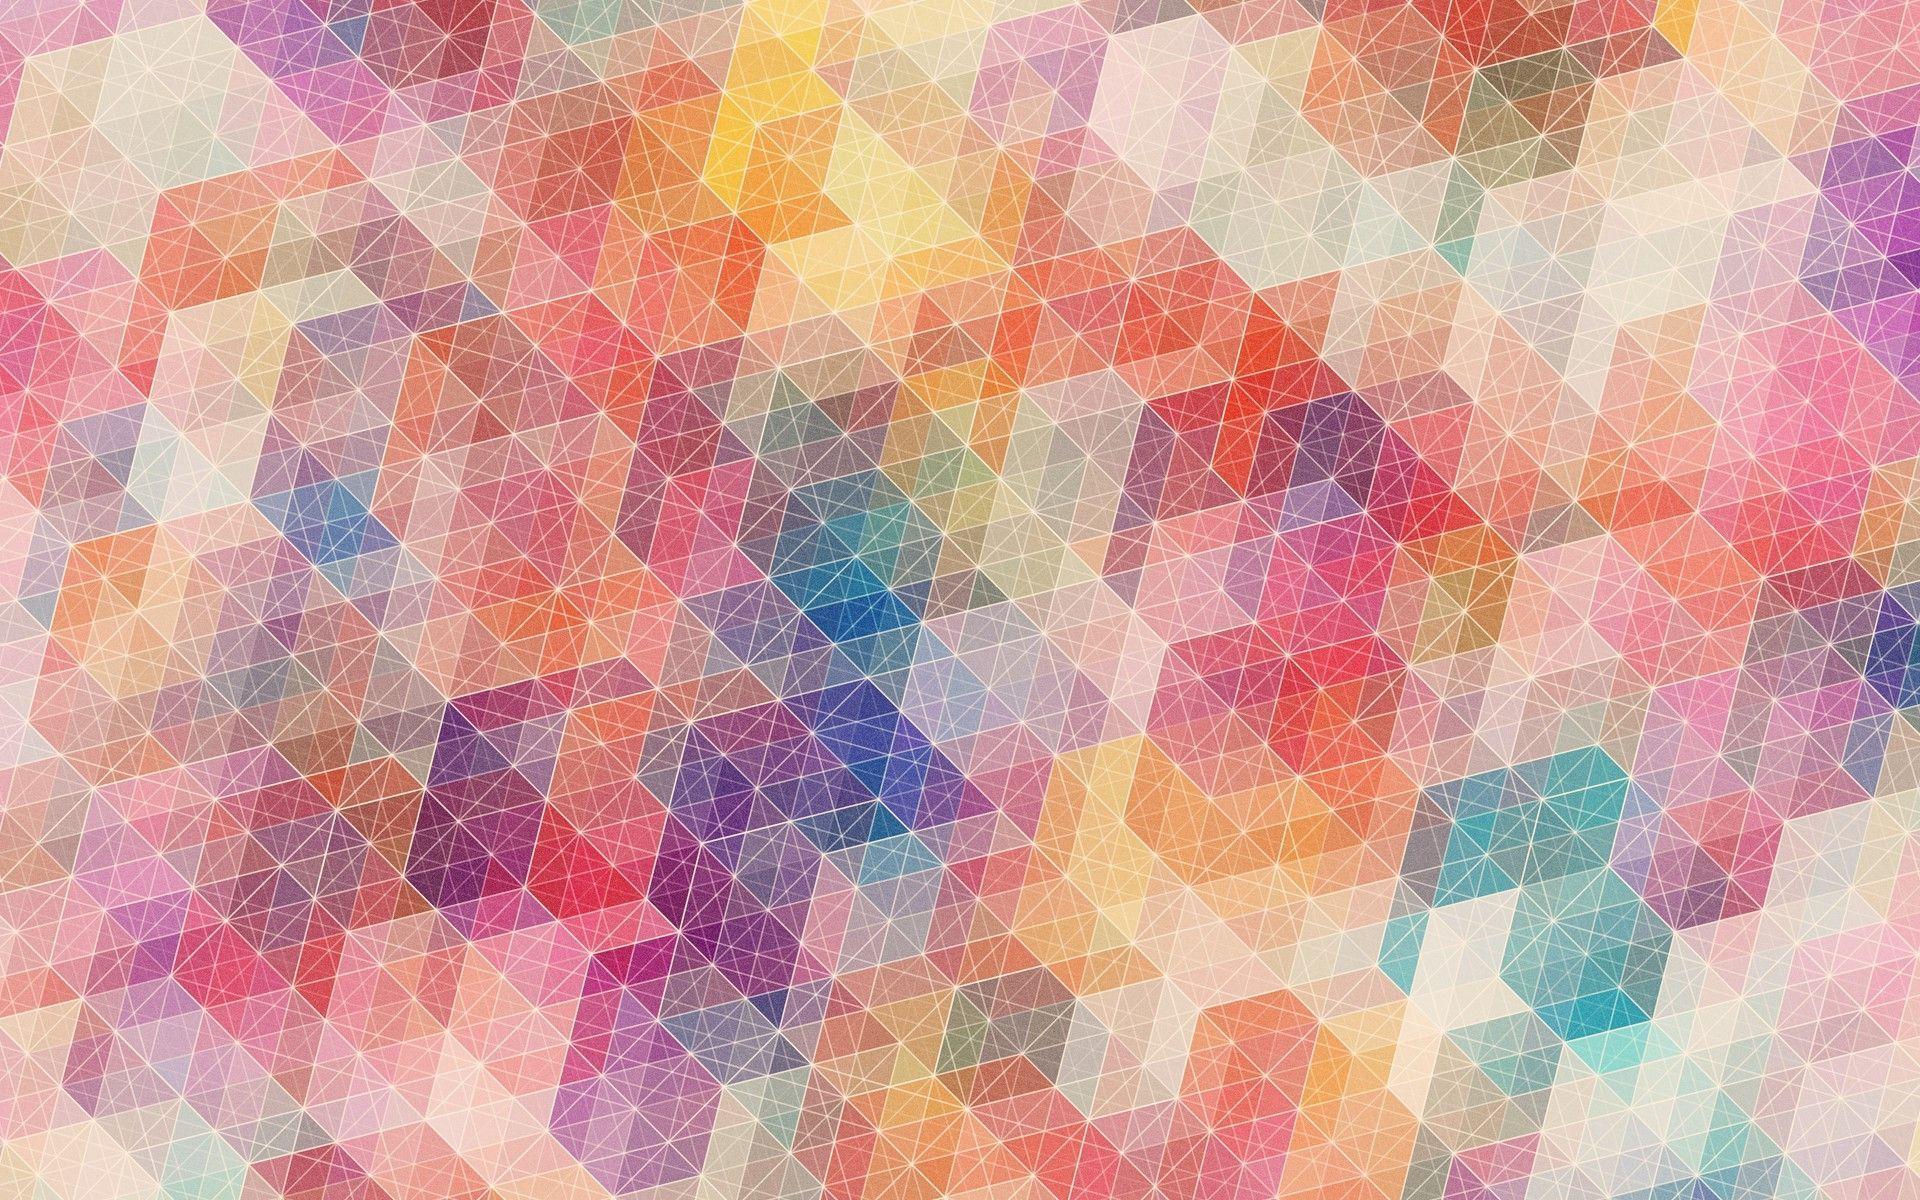 Geometric desktop wallpapers top free geometric desktop - Hd pattern wallpapers 1080p ...